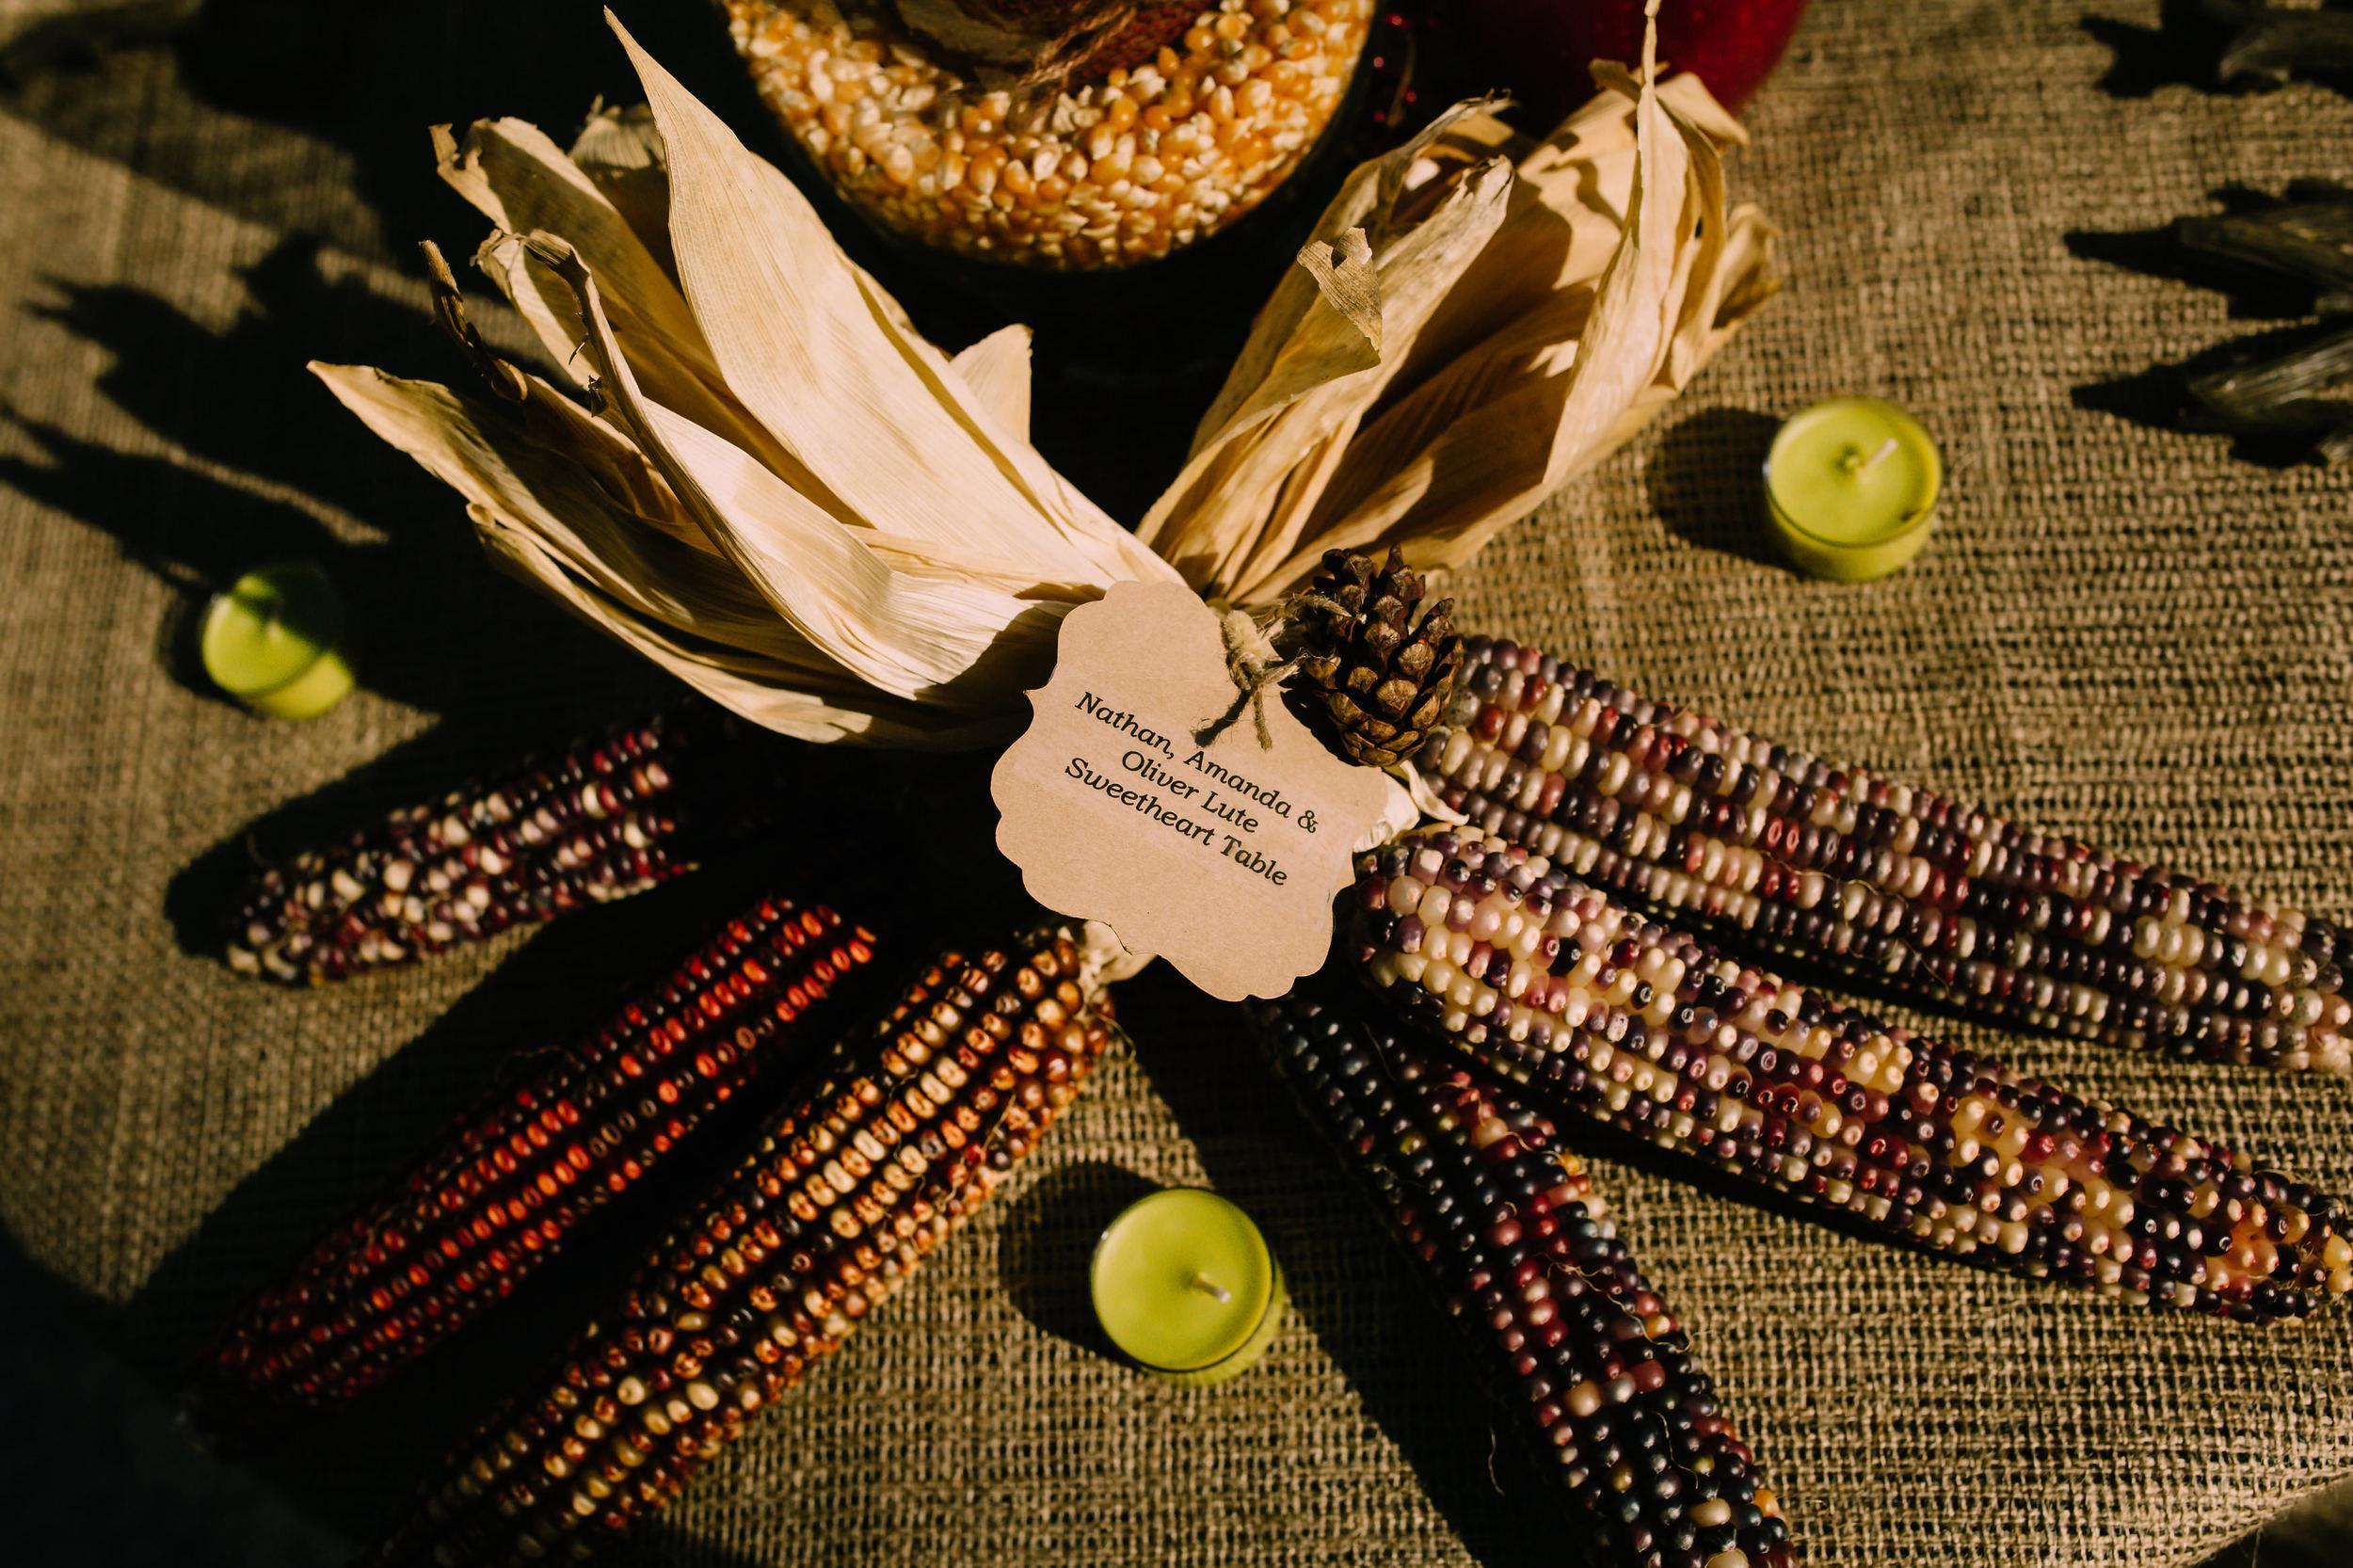 Bride and groom used corn stalks as fall wedding decor